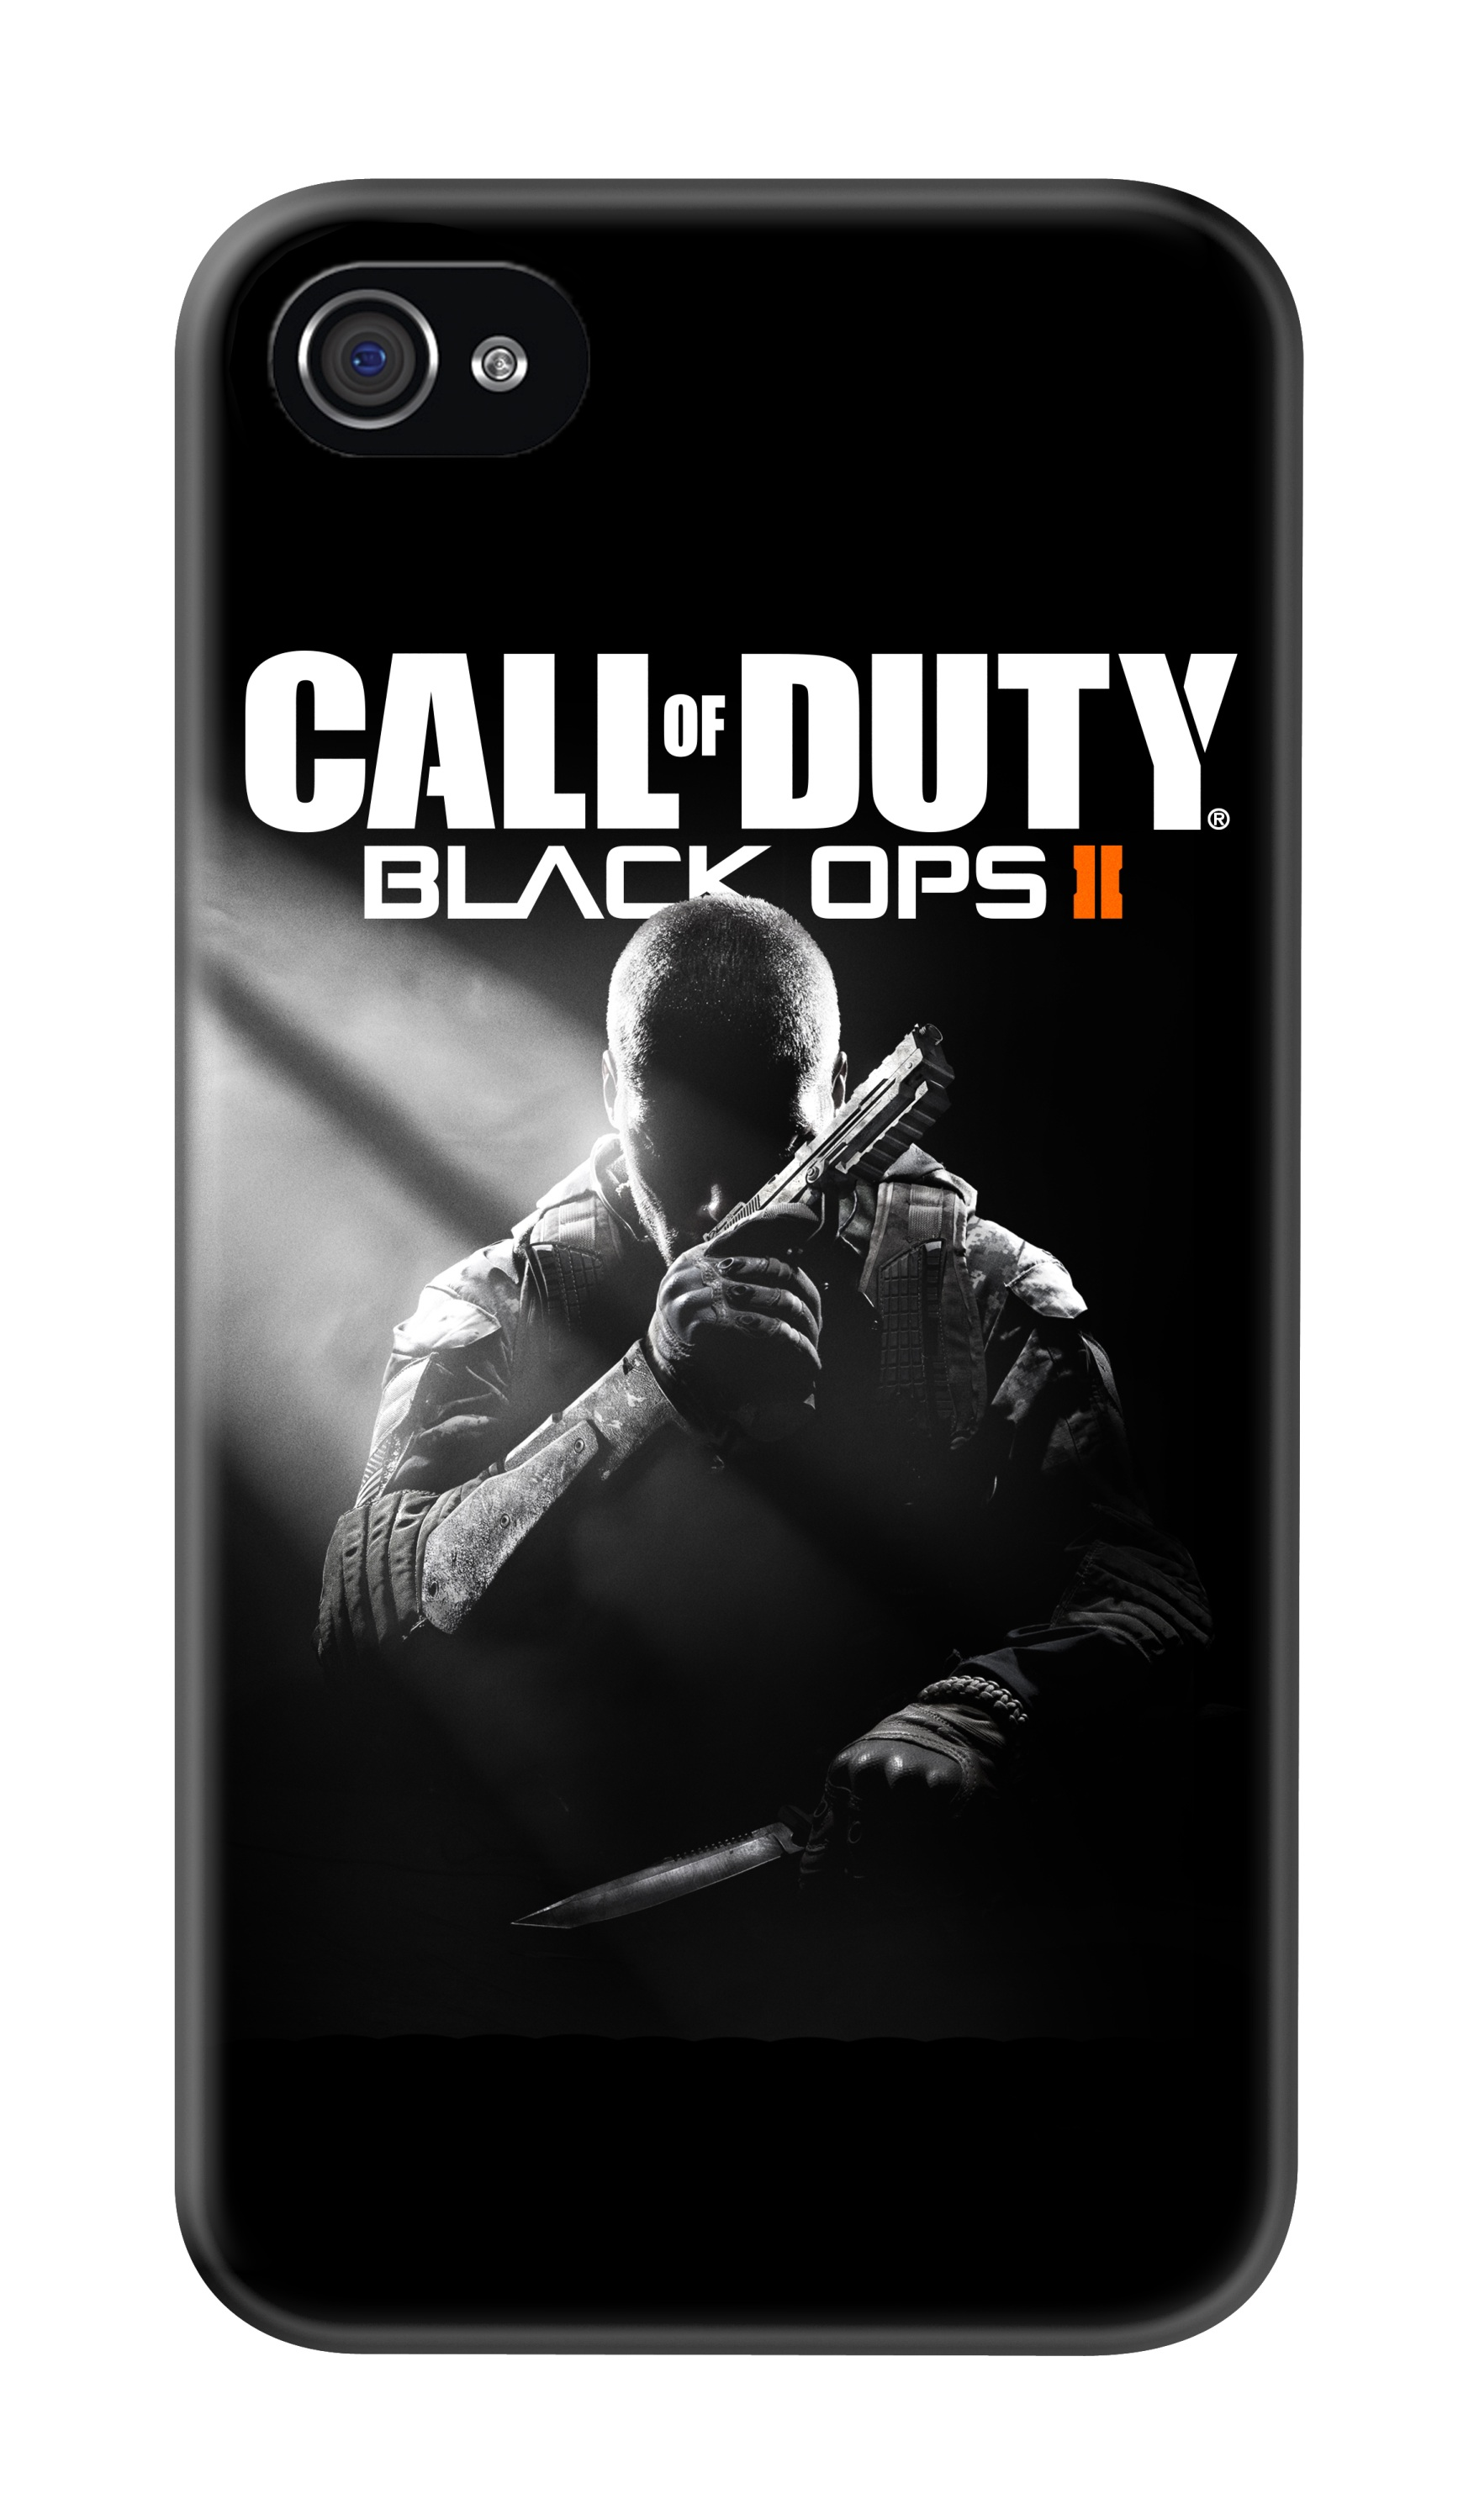 Black Ops Ii Accessories Announced Capsule Computers